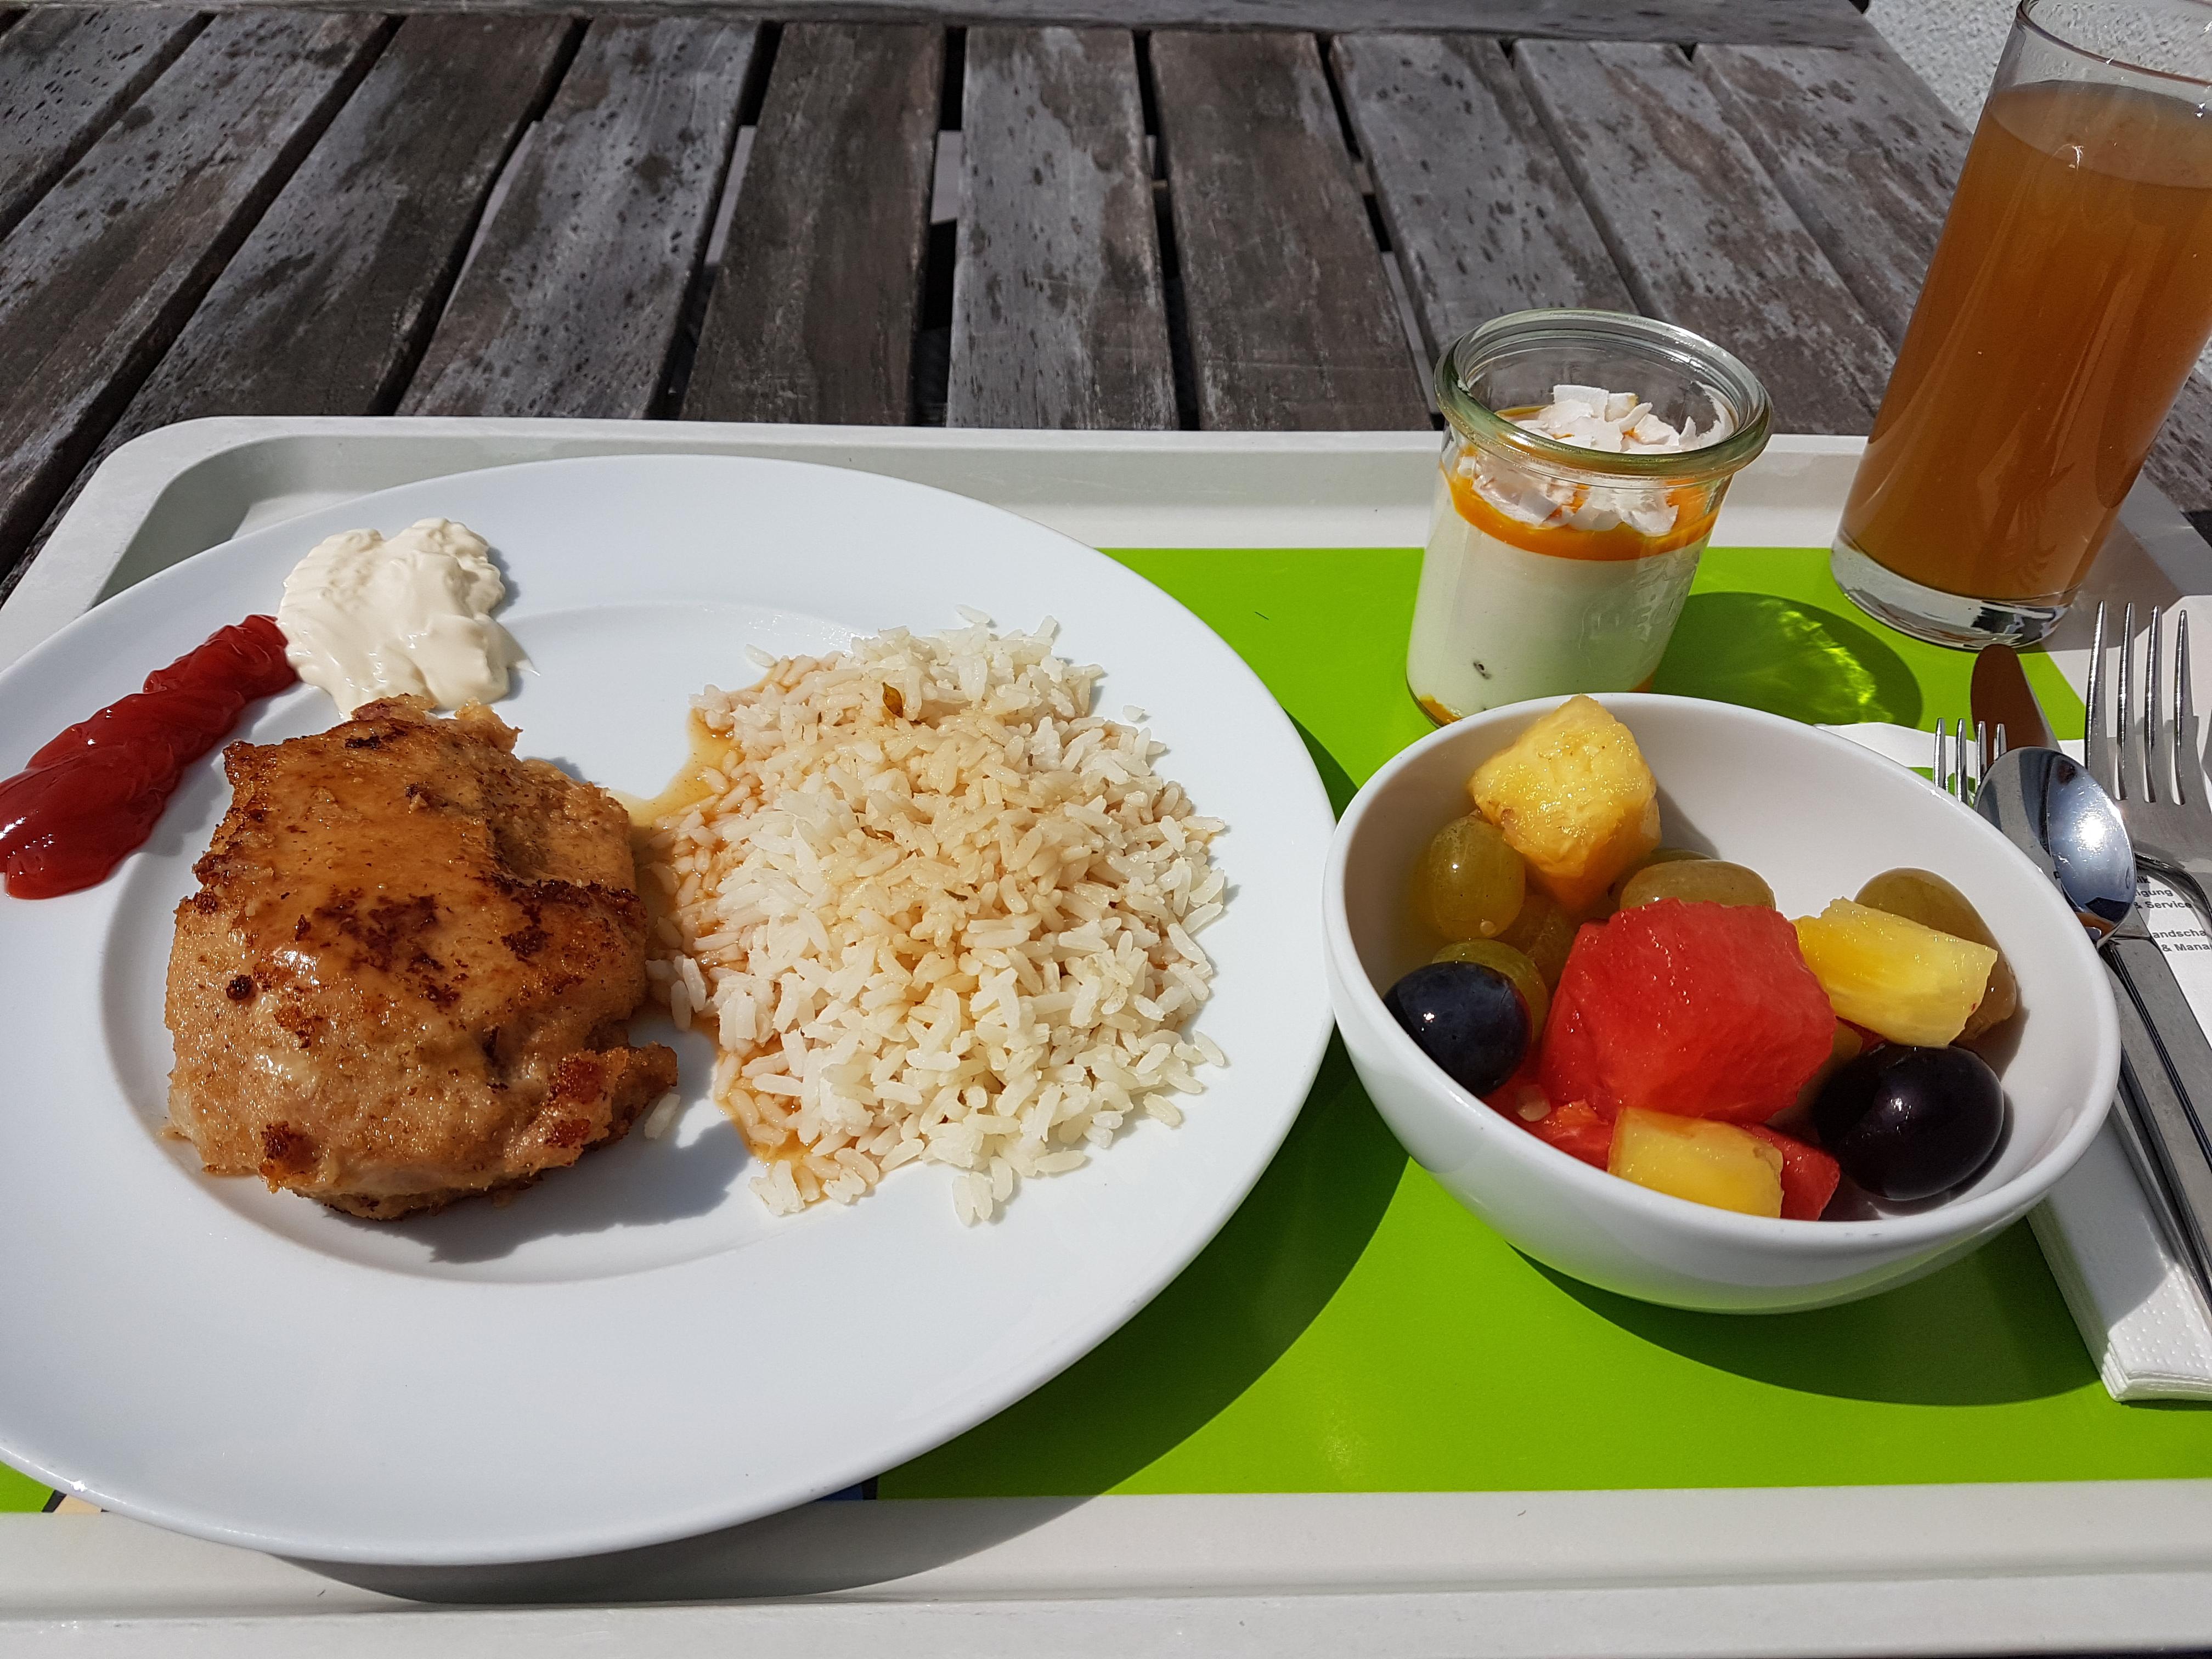 http://foodloader.net/Holz_2017-08-22_Cordon_bleu_mit_Reis.jpg